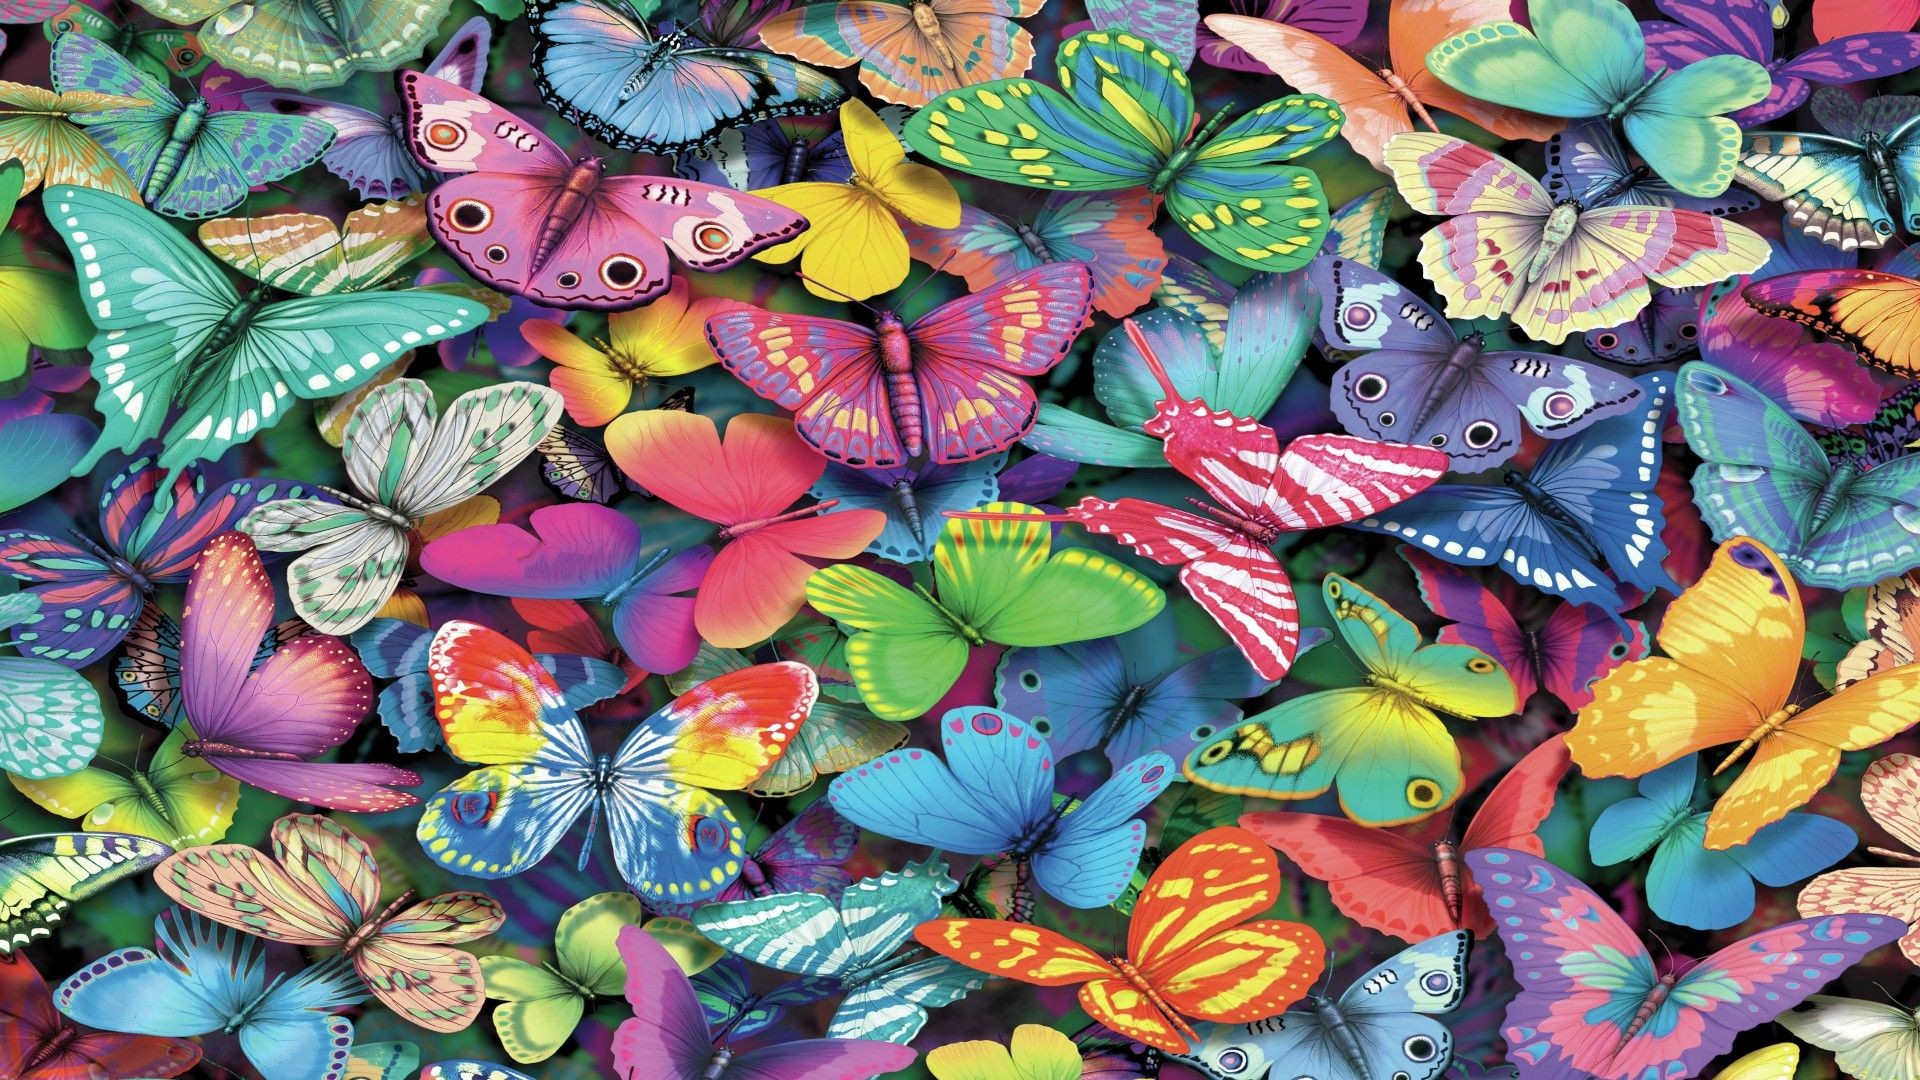 Butterfly Wallpaper Rainbow Butterfly Wallpaper Hd: Butterfly Desktop Backgrounds ·① WallpaperTag